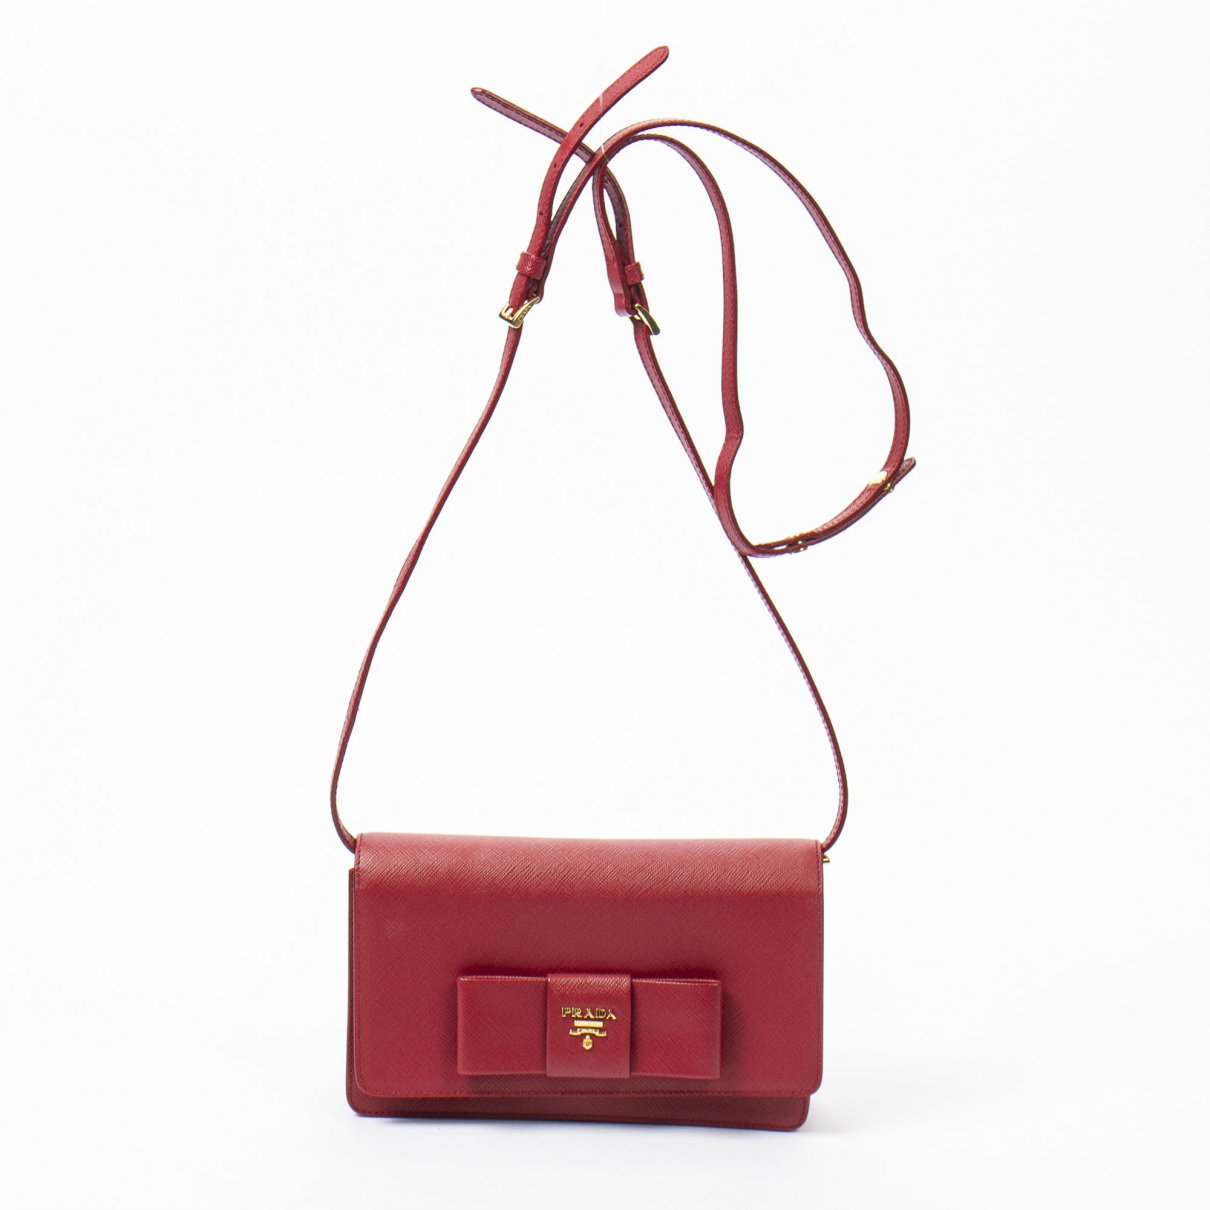 Prada Ribbon Handtasche in  Rot Leder